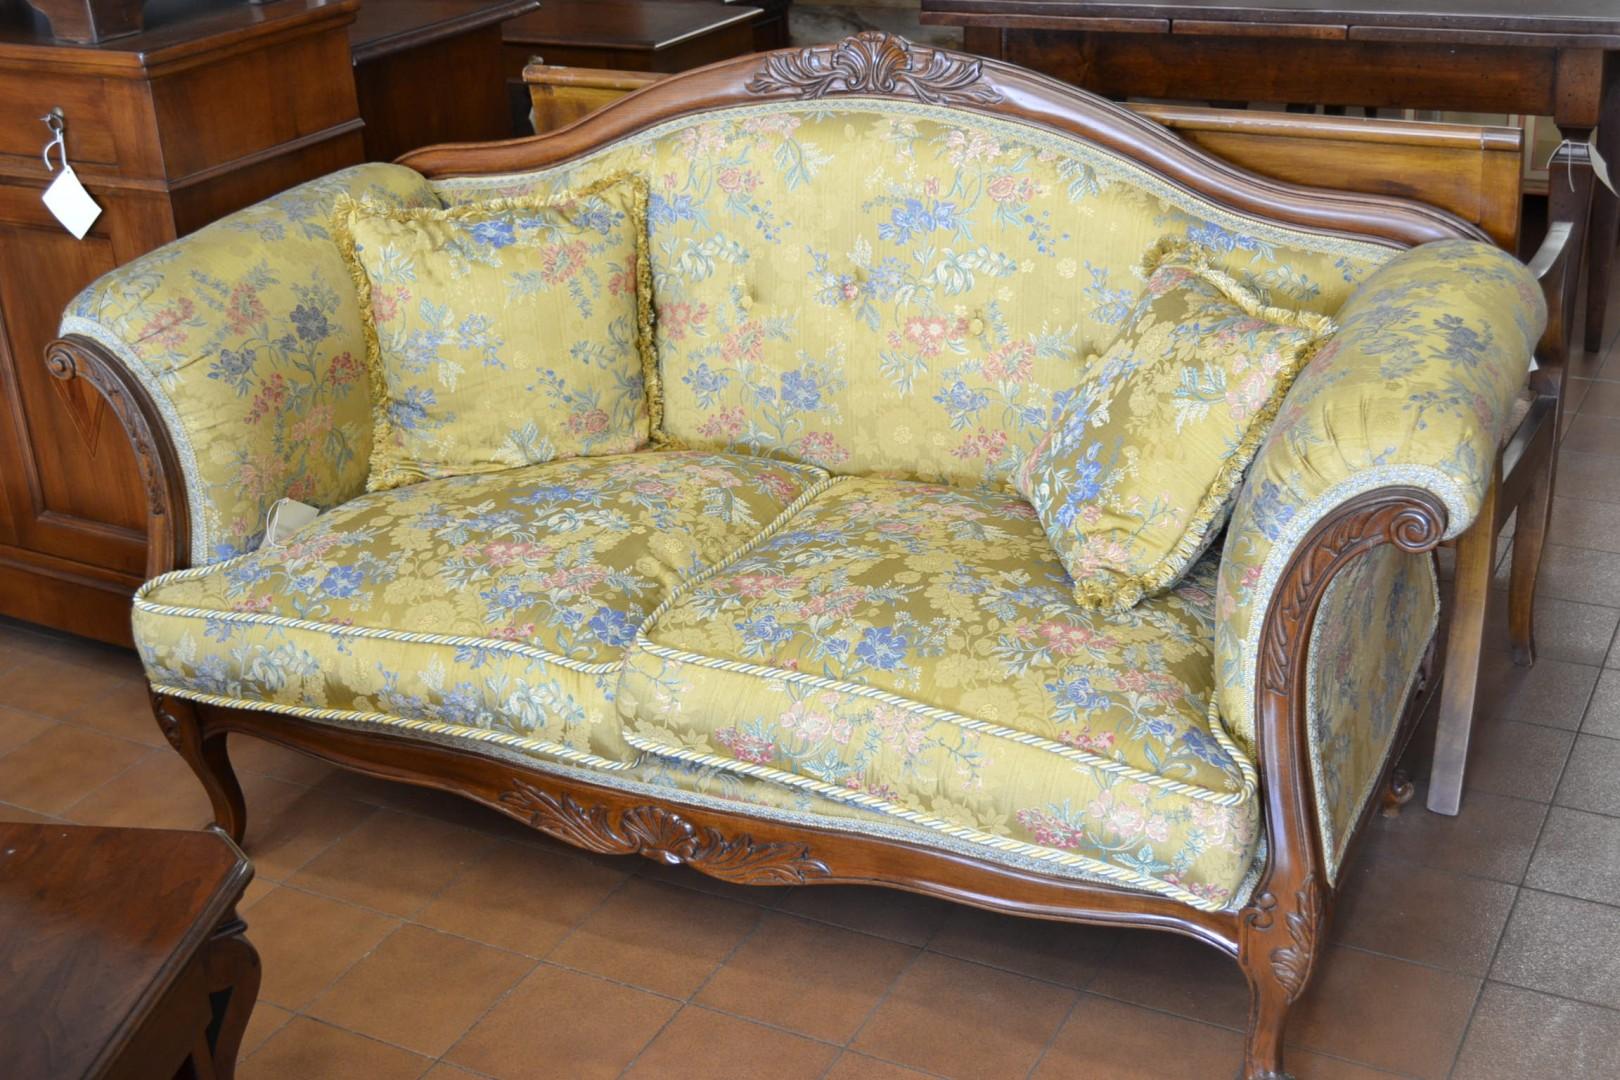 Divano stile inglese livio bernardi mobili mobili d 39 arte artigianali in legno - Divano in inglese ...